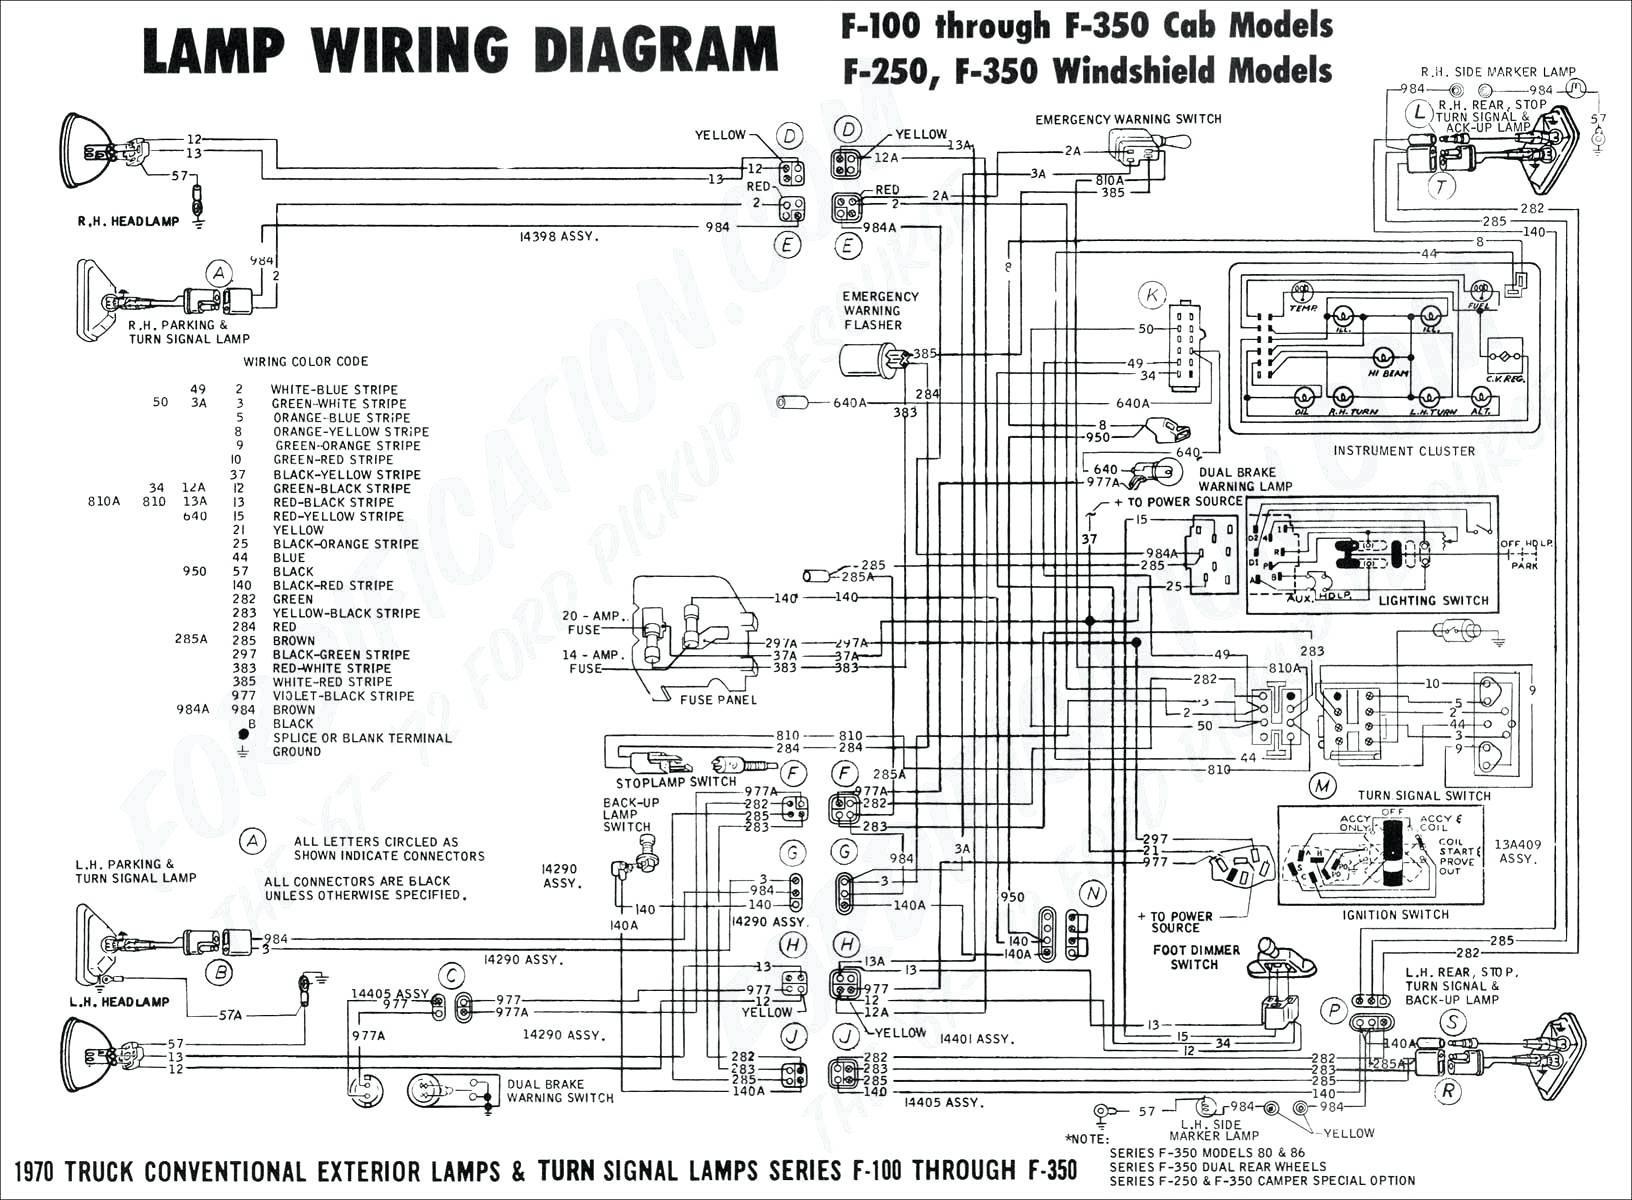 Circuit Electric For Guide: 2007 mercury milan radio